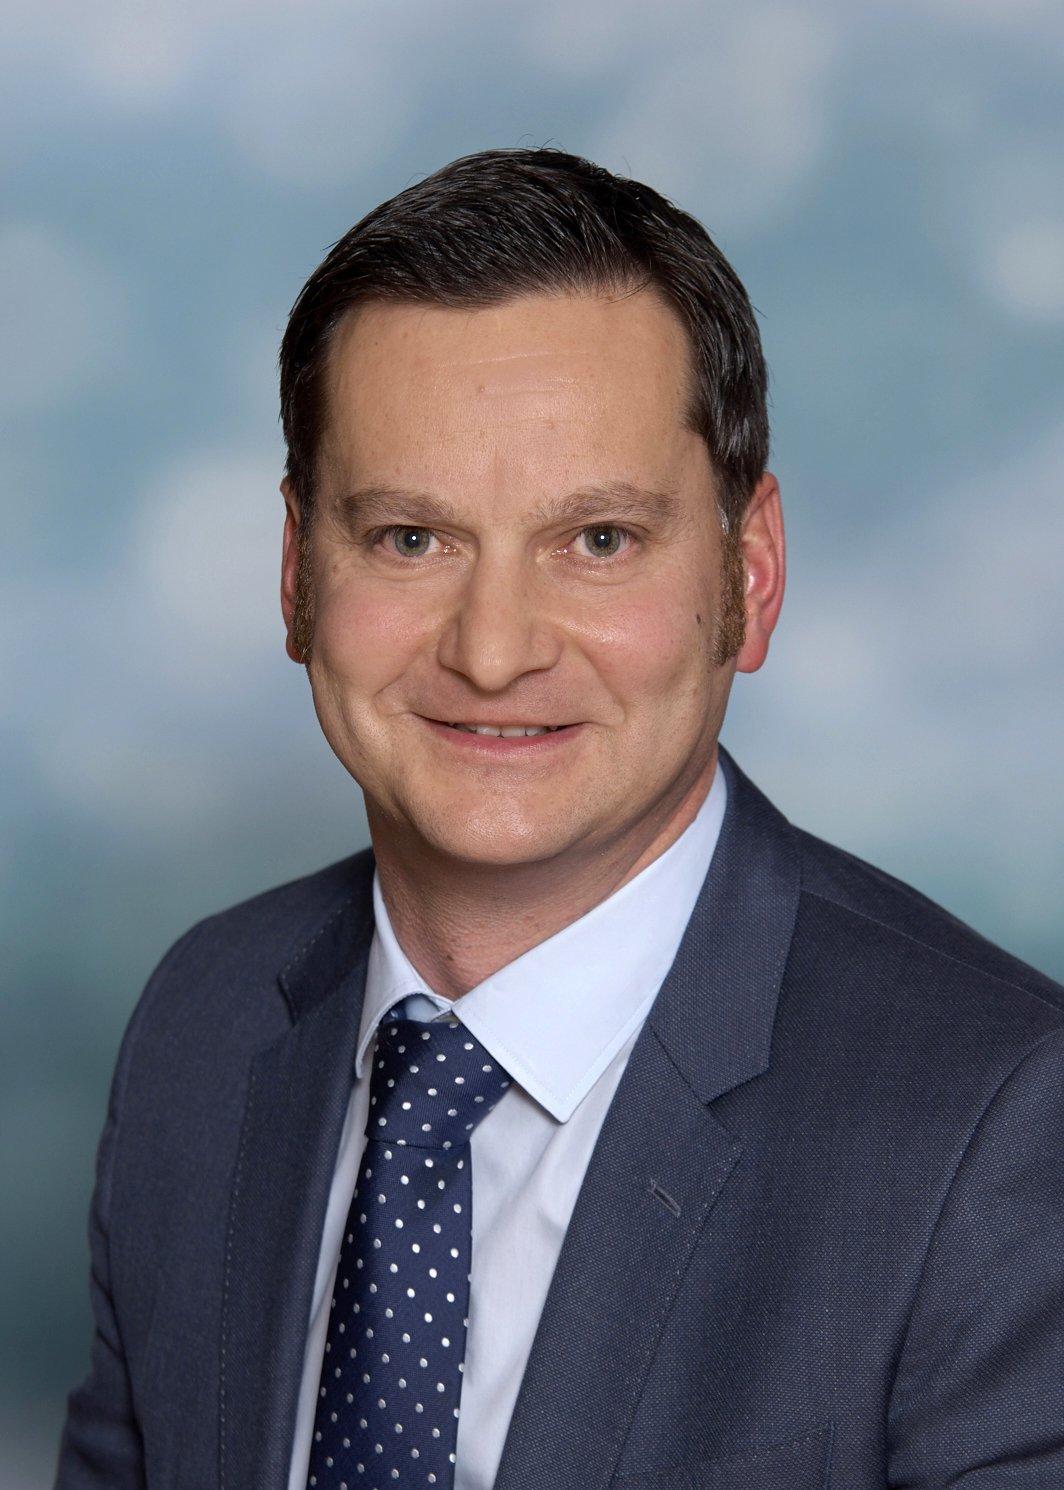 Wolfgang Krakolinig